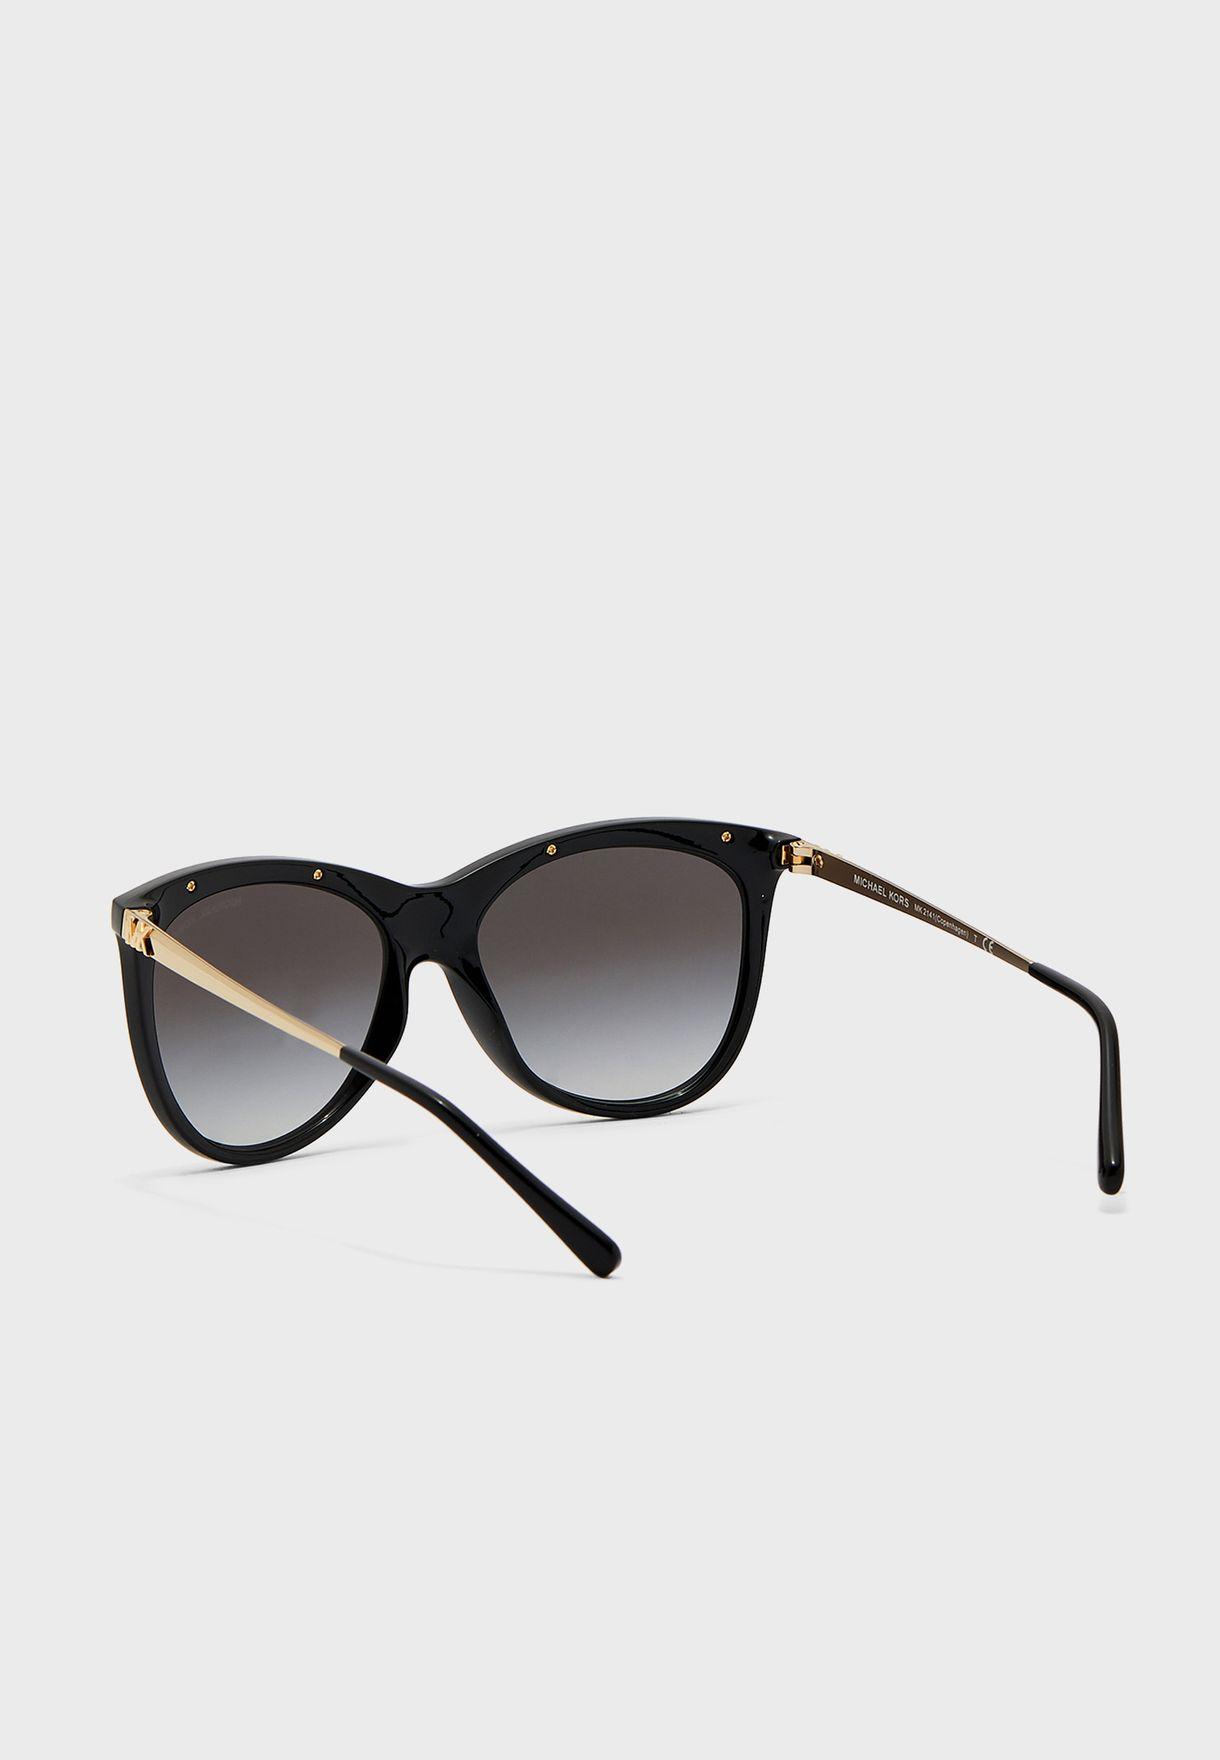 0Mk2141 Wayfarer Sunglasses